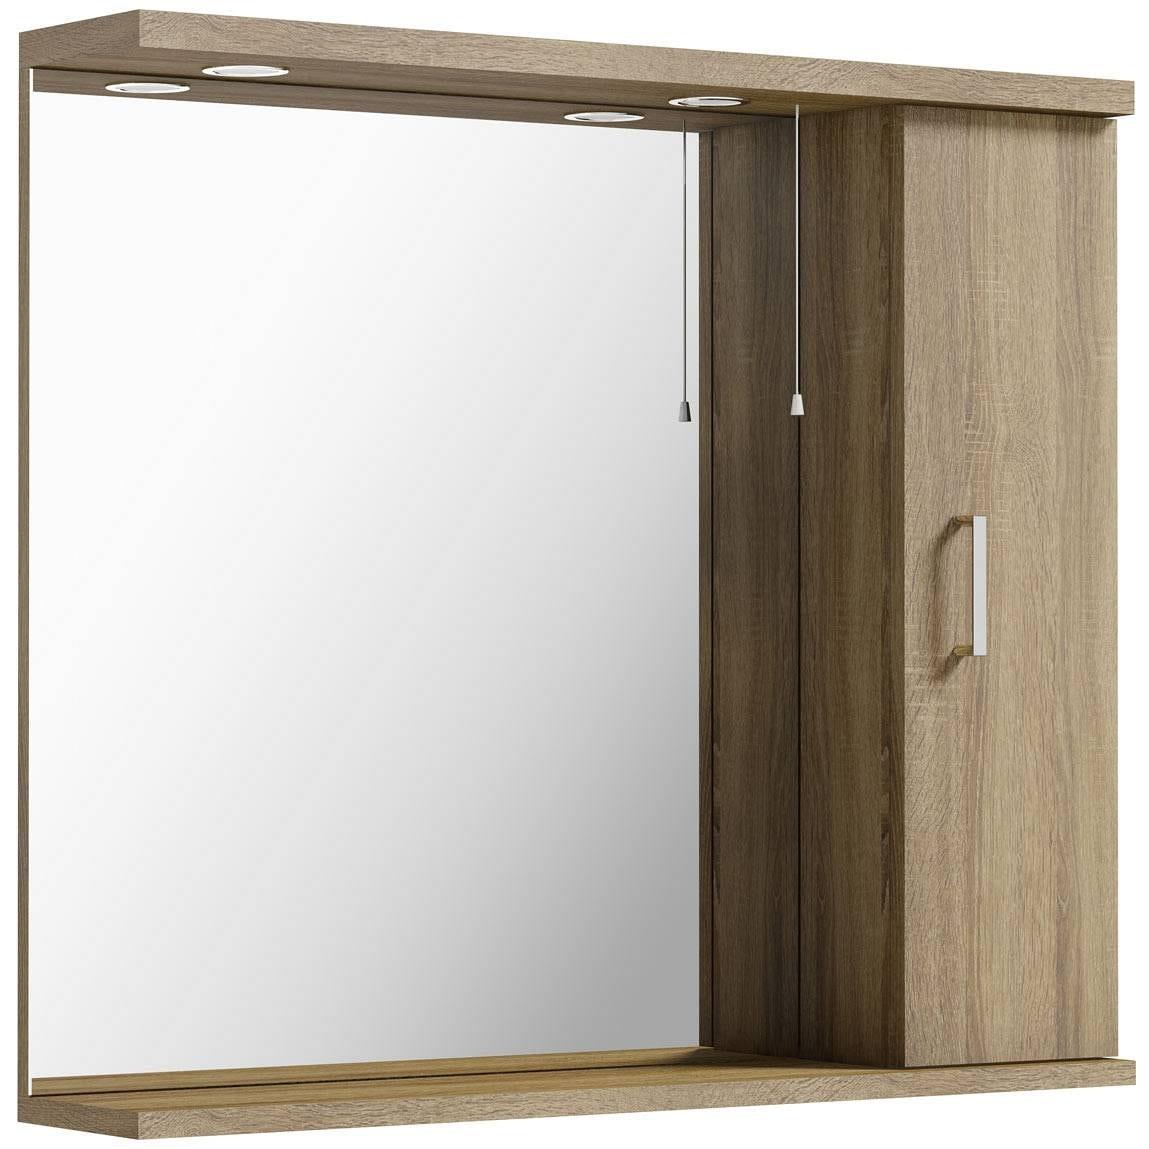 Sienna oak bathroom mirror with lights 850mm